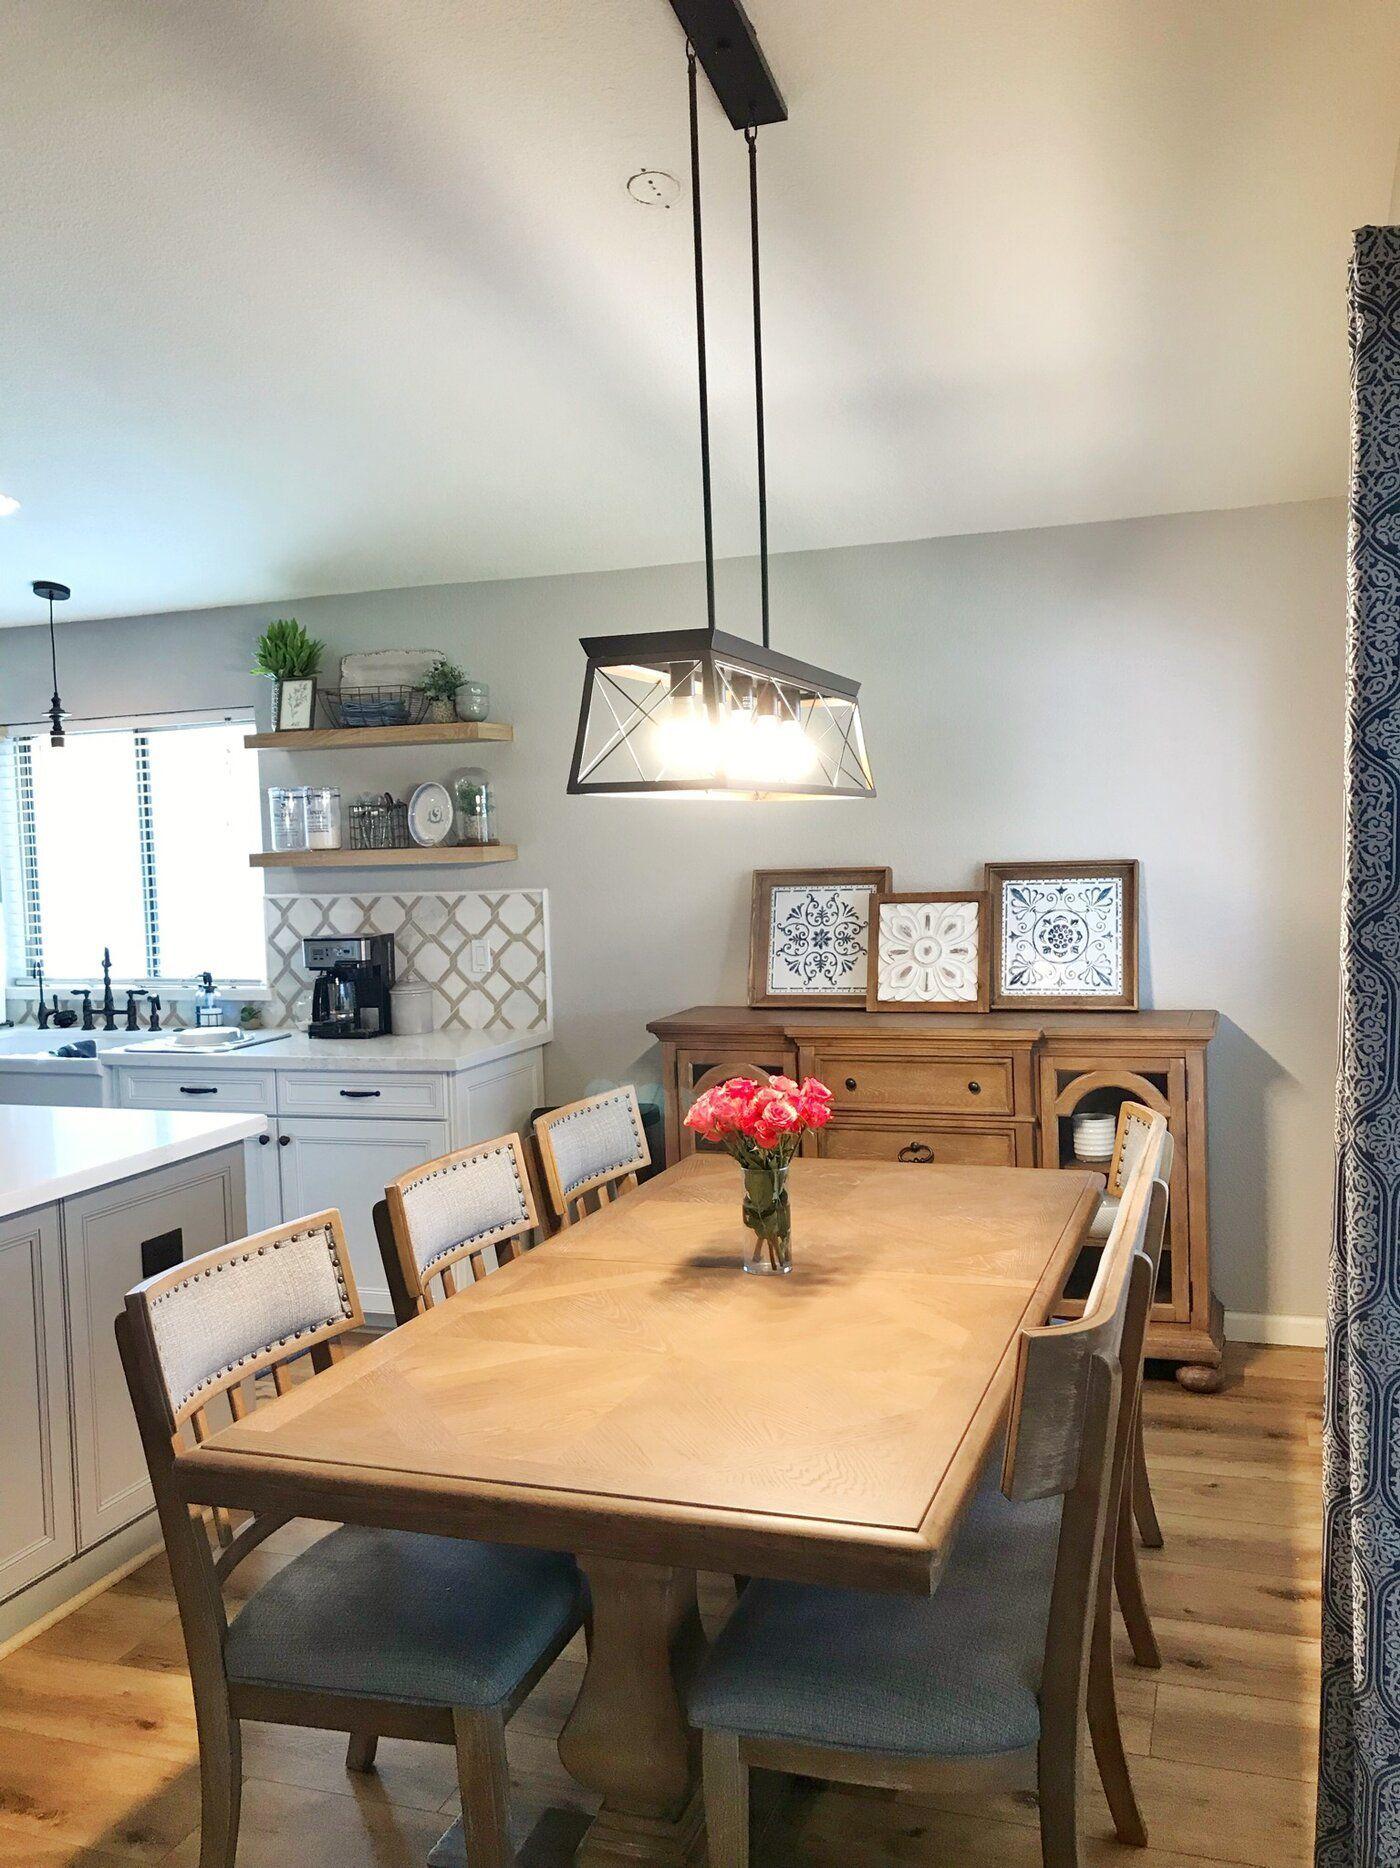 Laurel foundry modern farmhouse delon 5light kitchen